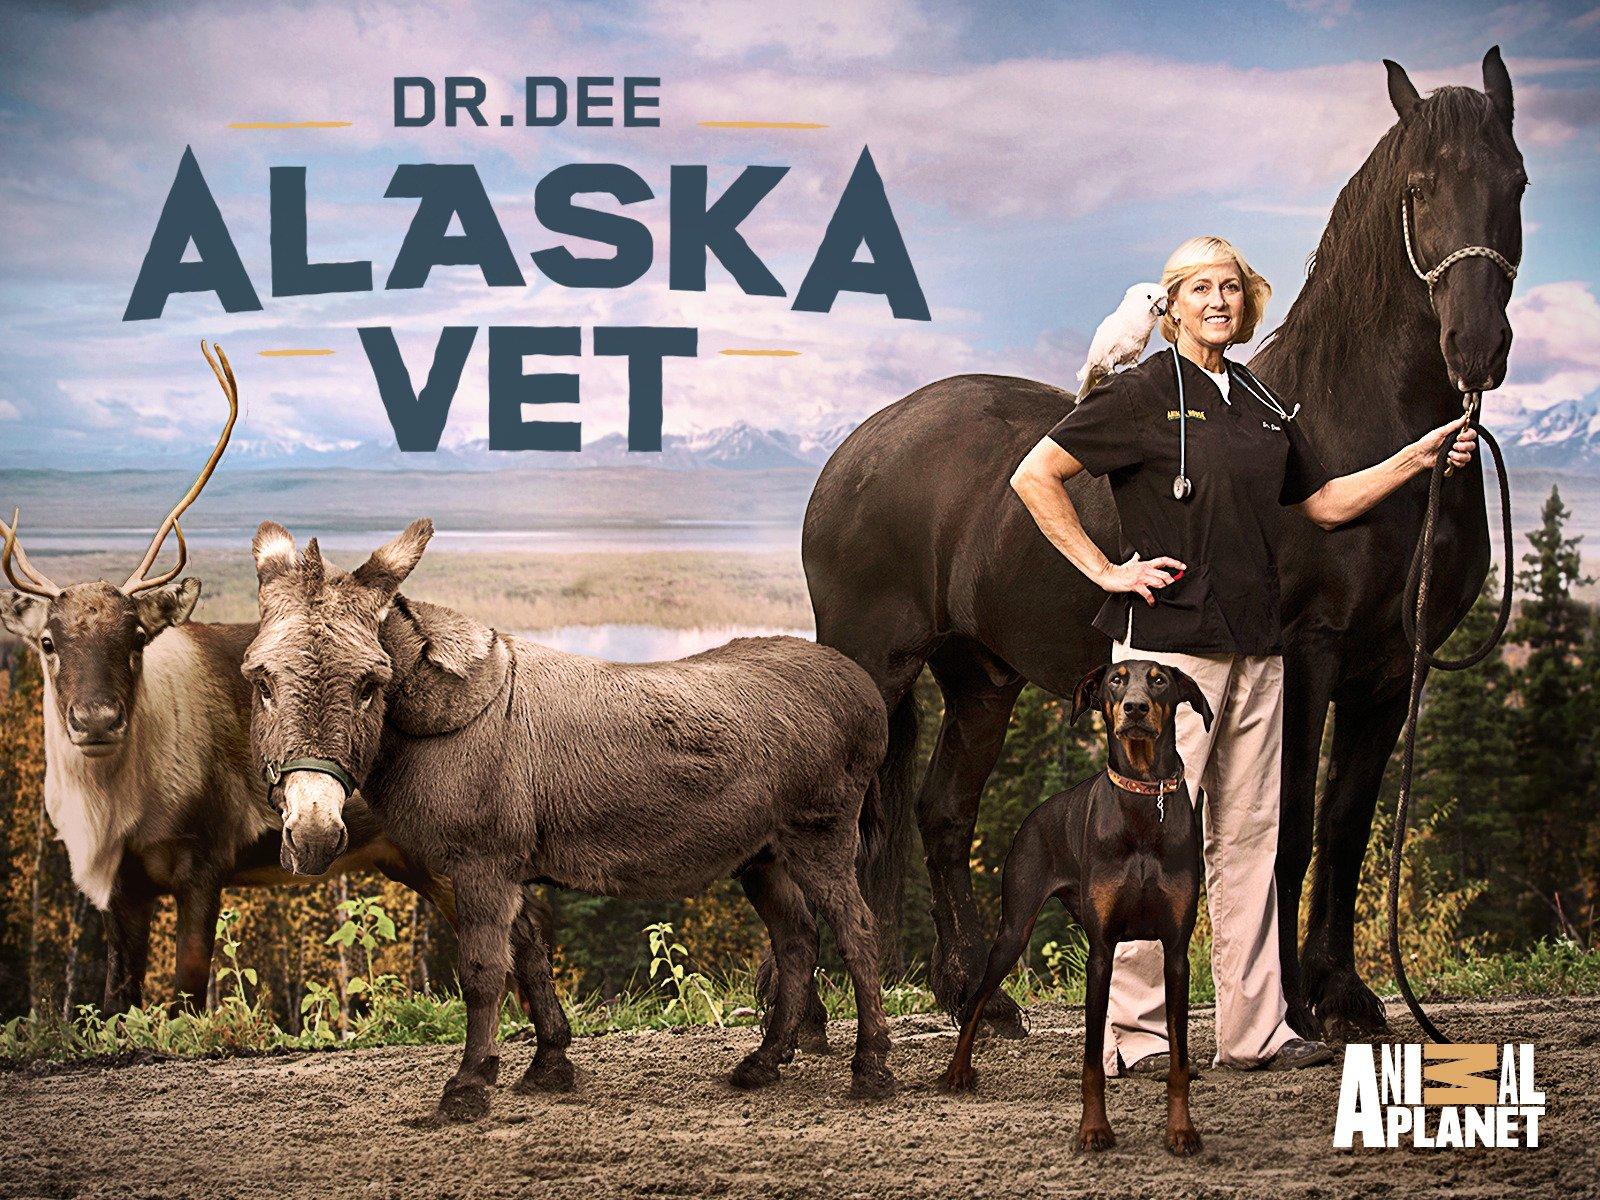 Amazon.com: Dr. Dee Alaska Vet Season 1: Amazon Digital Services LLC